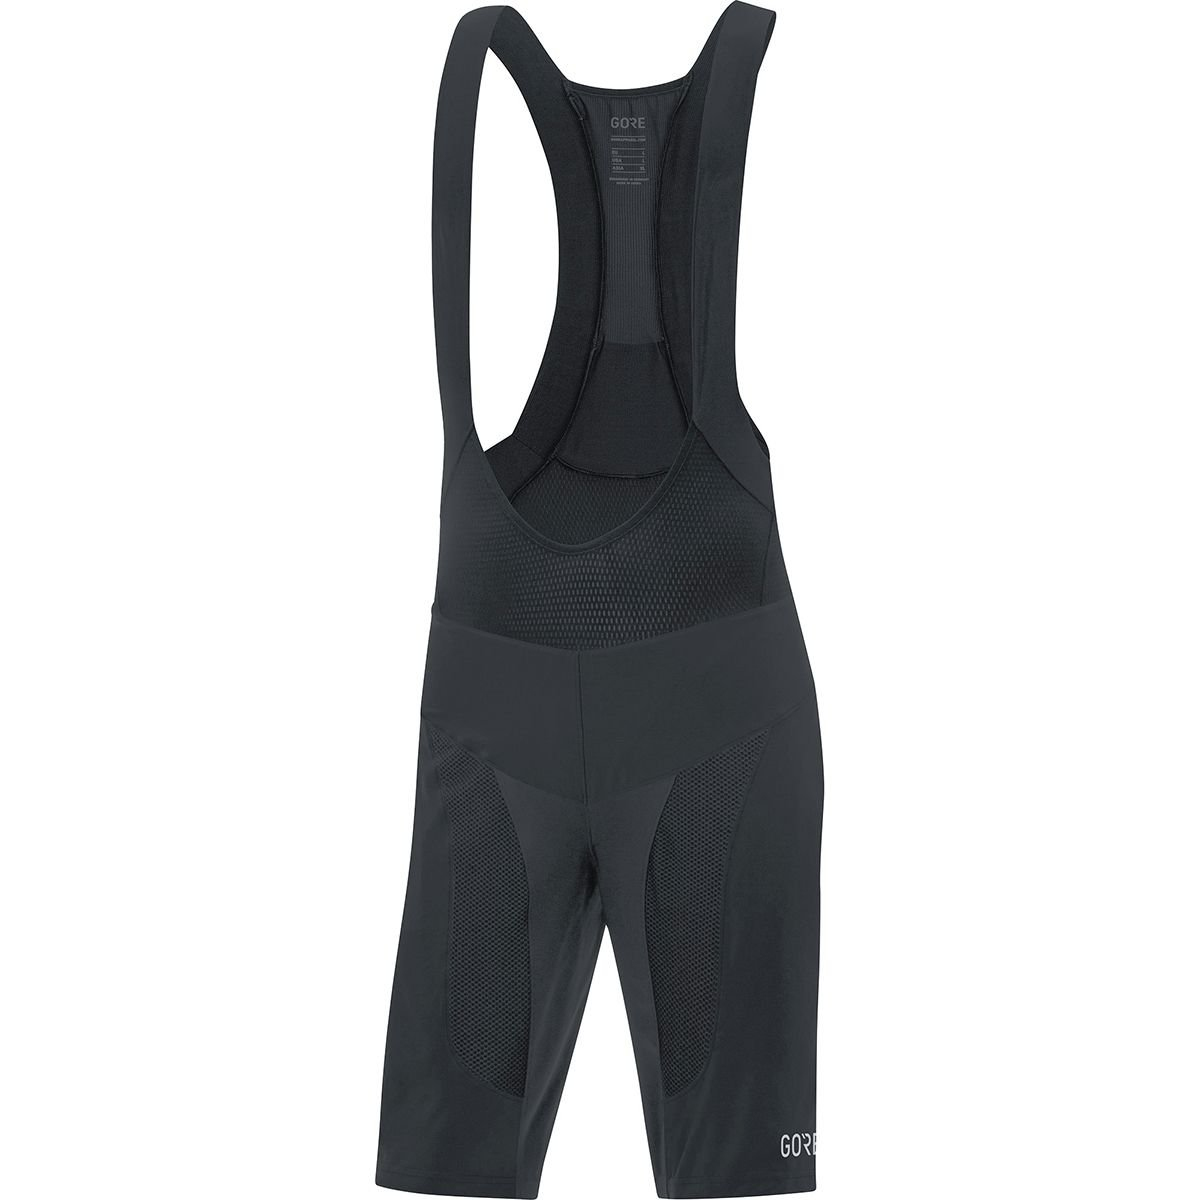 GORE Wear C7 2in1 Men's Mountain Cycling Bib Shorts With Seat Insert, S, Black